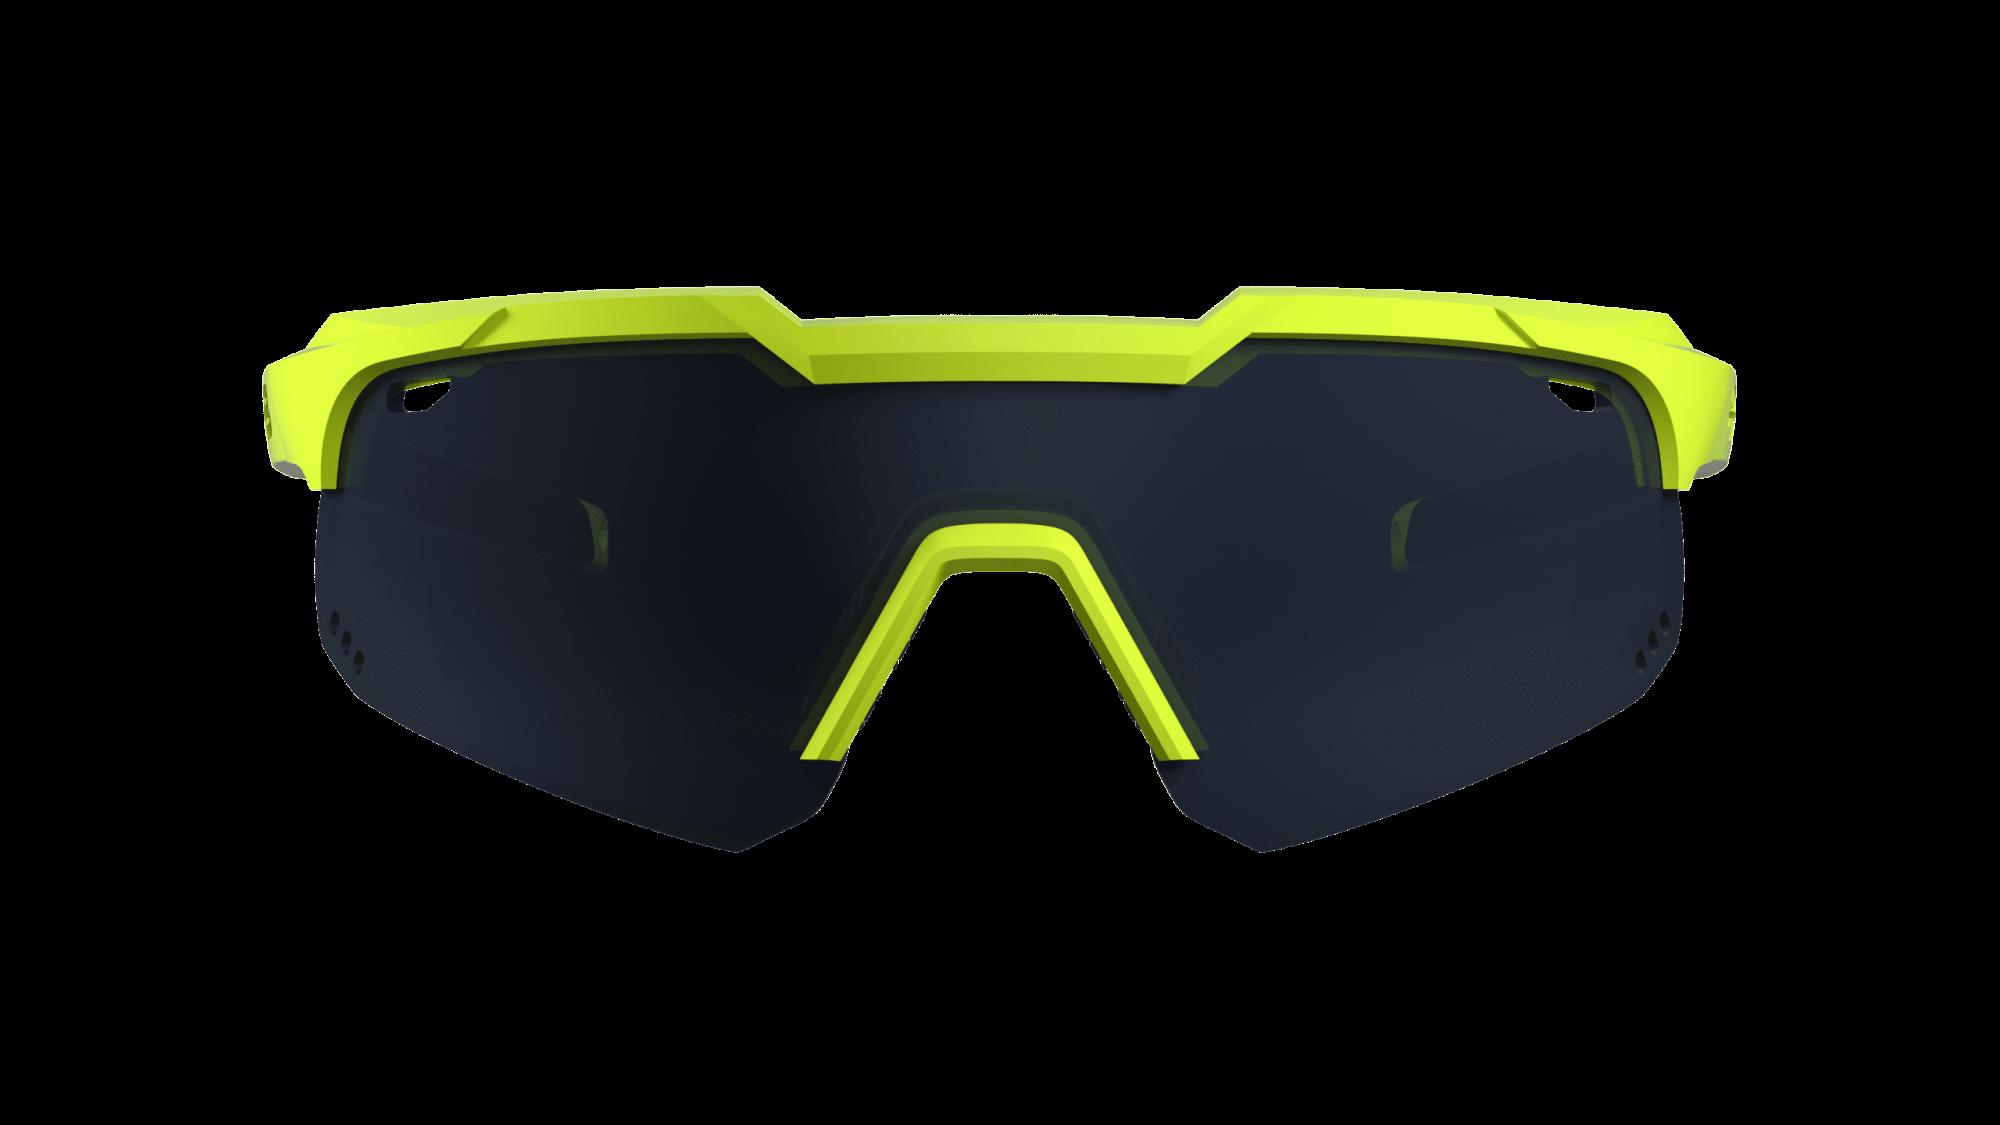 Óculos Shield Evo Mountain HB Neon Yellow Gray